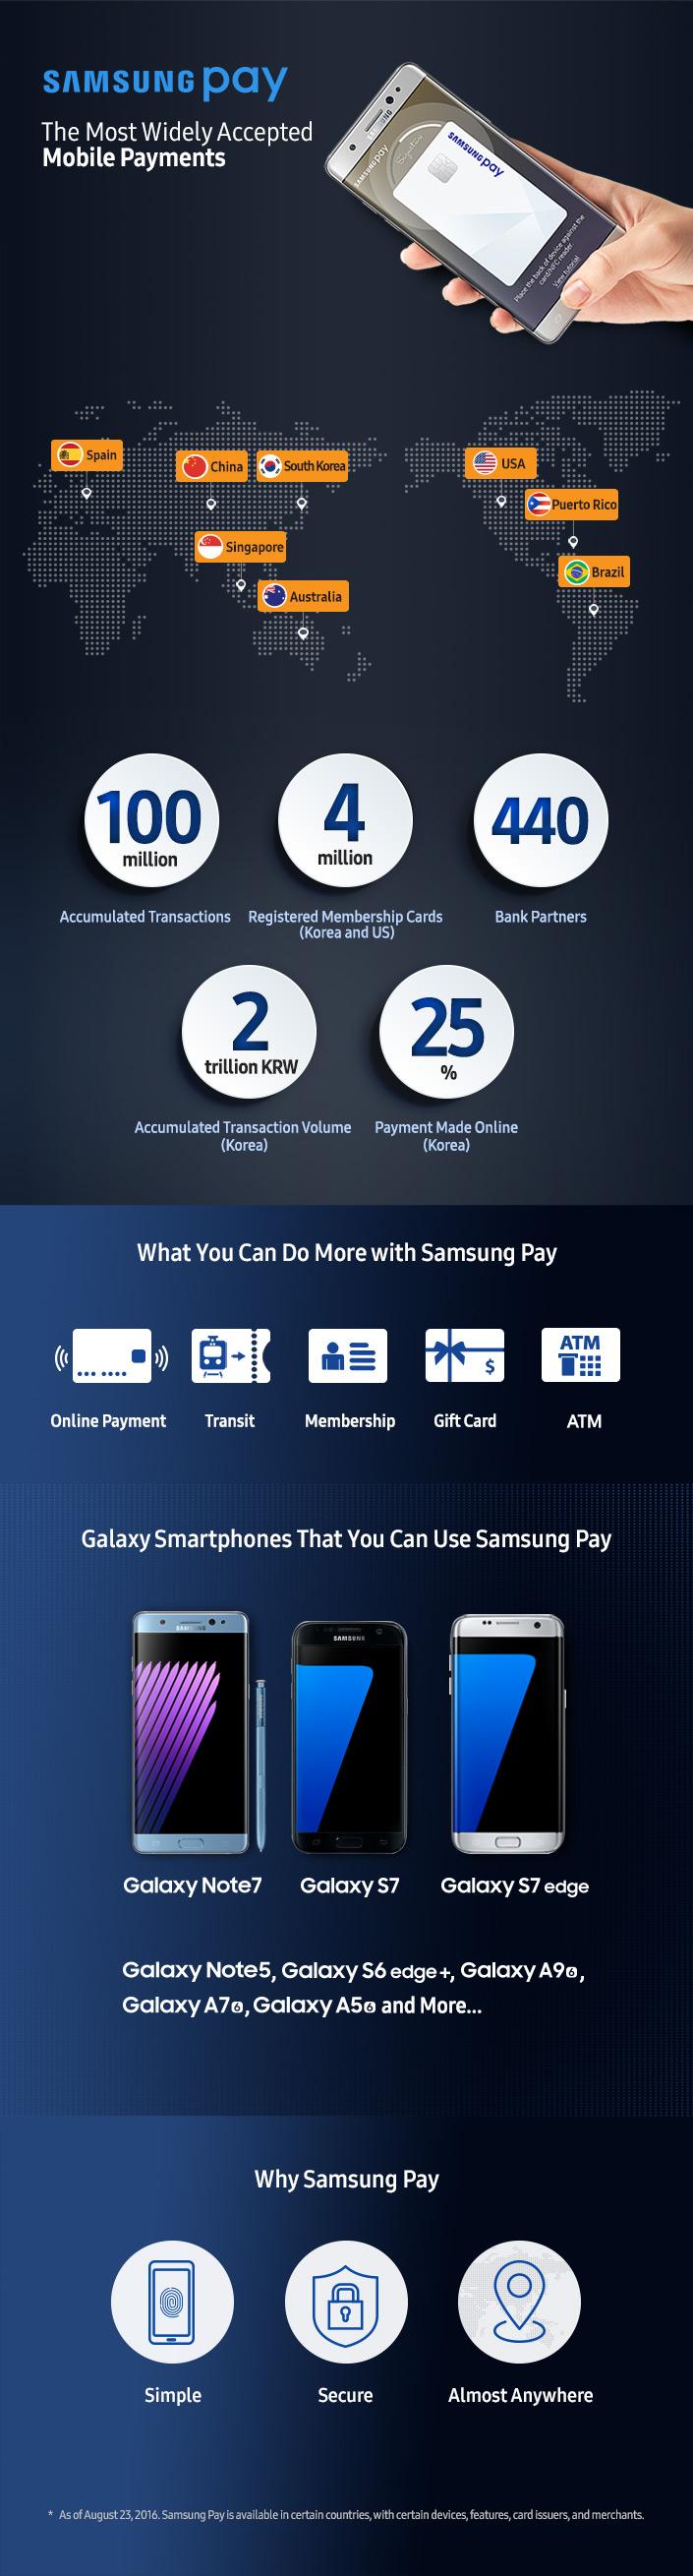 news-samsungpay-infografika Samsung Pay kończy rok i ma się świetnie